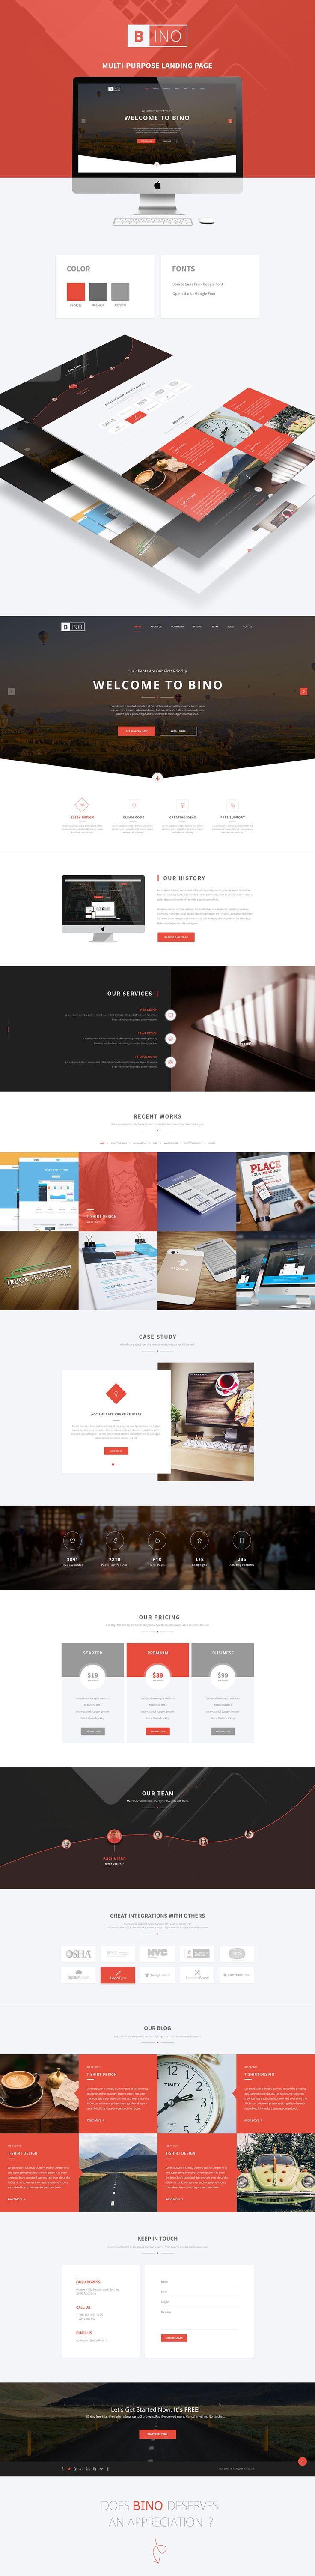 Freebie | Bino Landing Page PSD Template on Behance